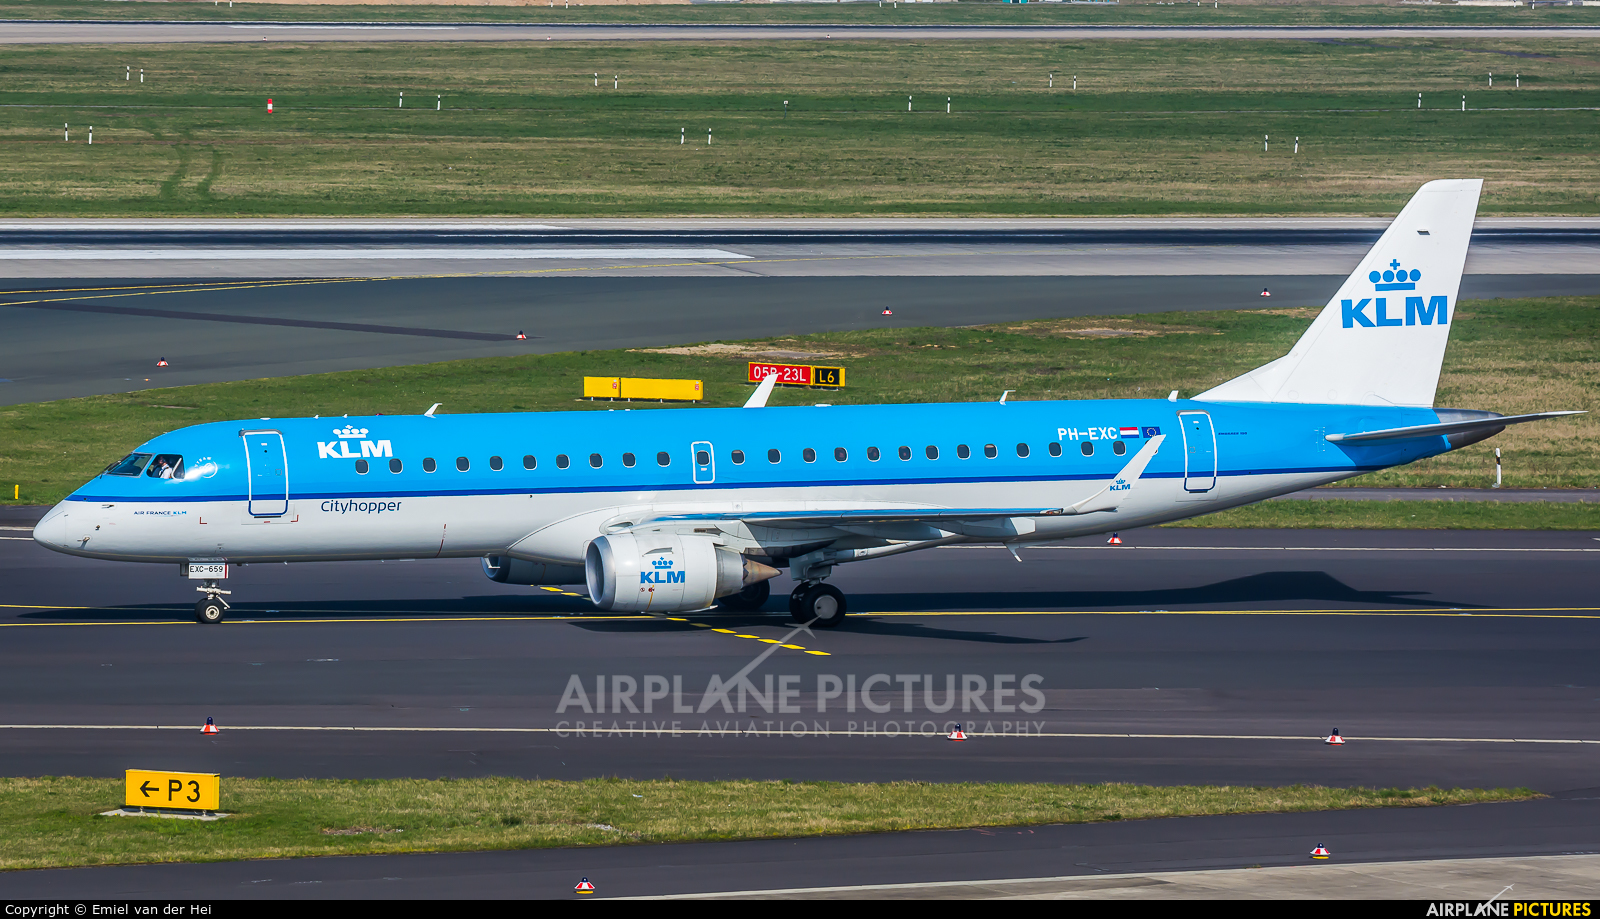 KLM Cityhopper PH-EXC aircraft at Düsseldorf